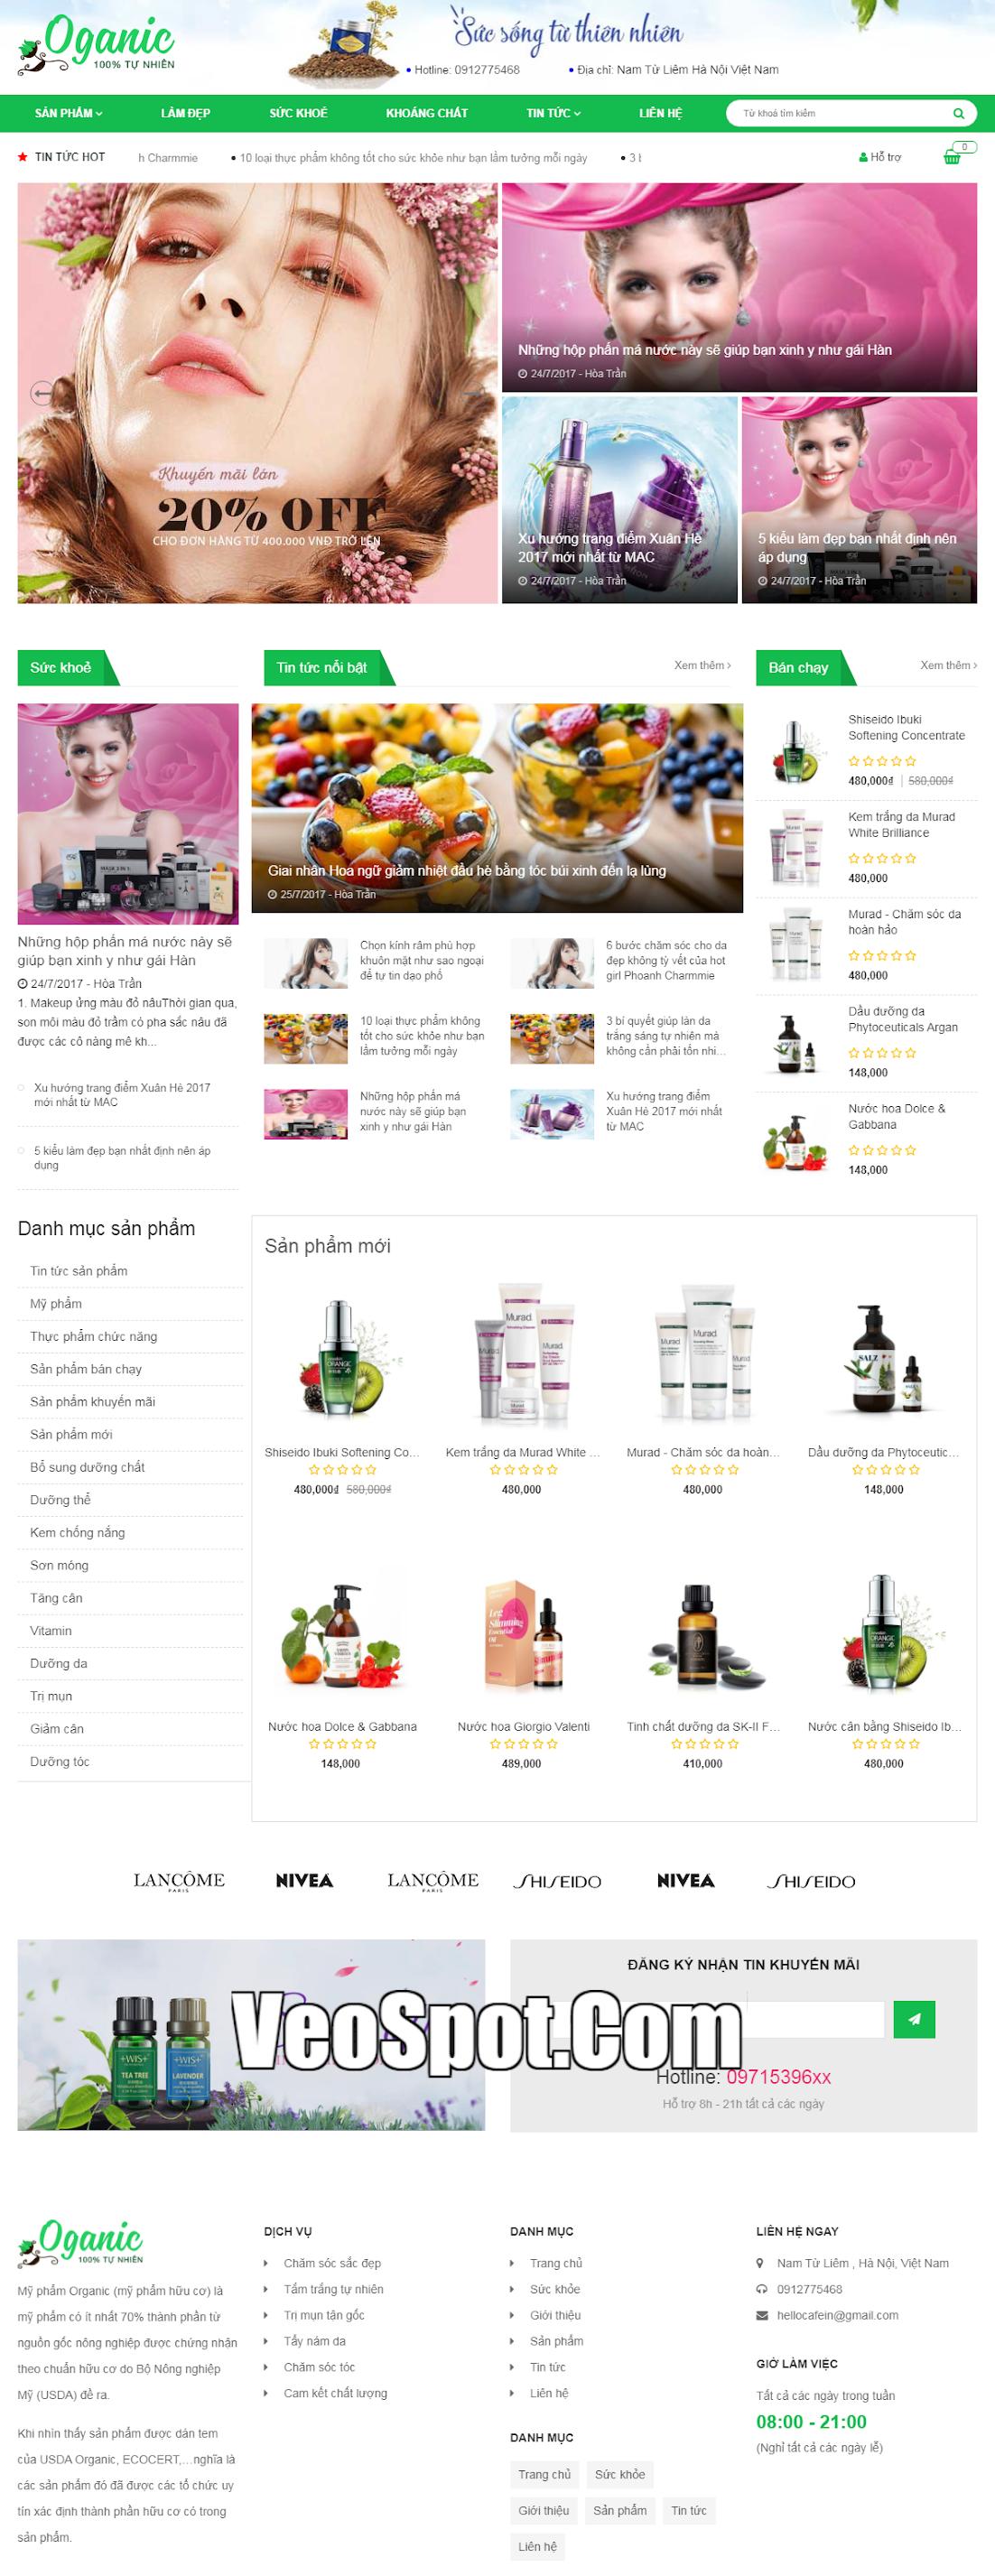 Template blogger bán hàng Oganic affiliate marketing